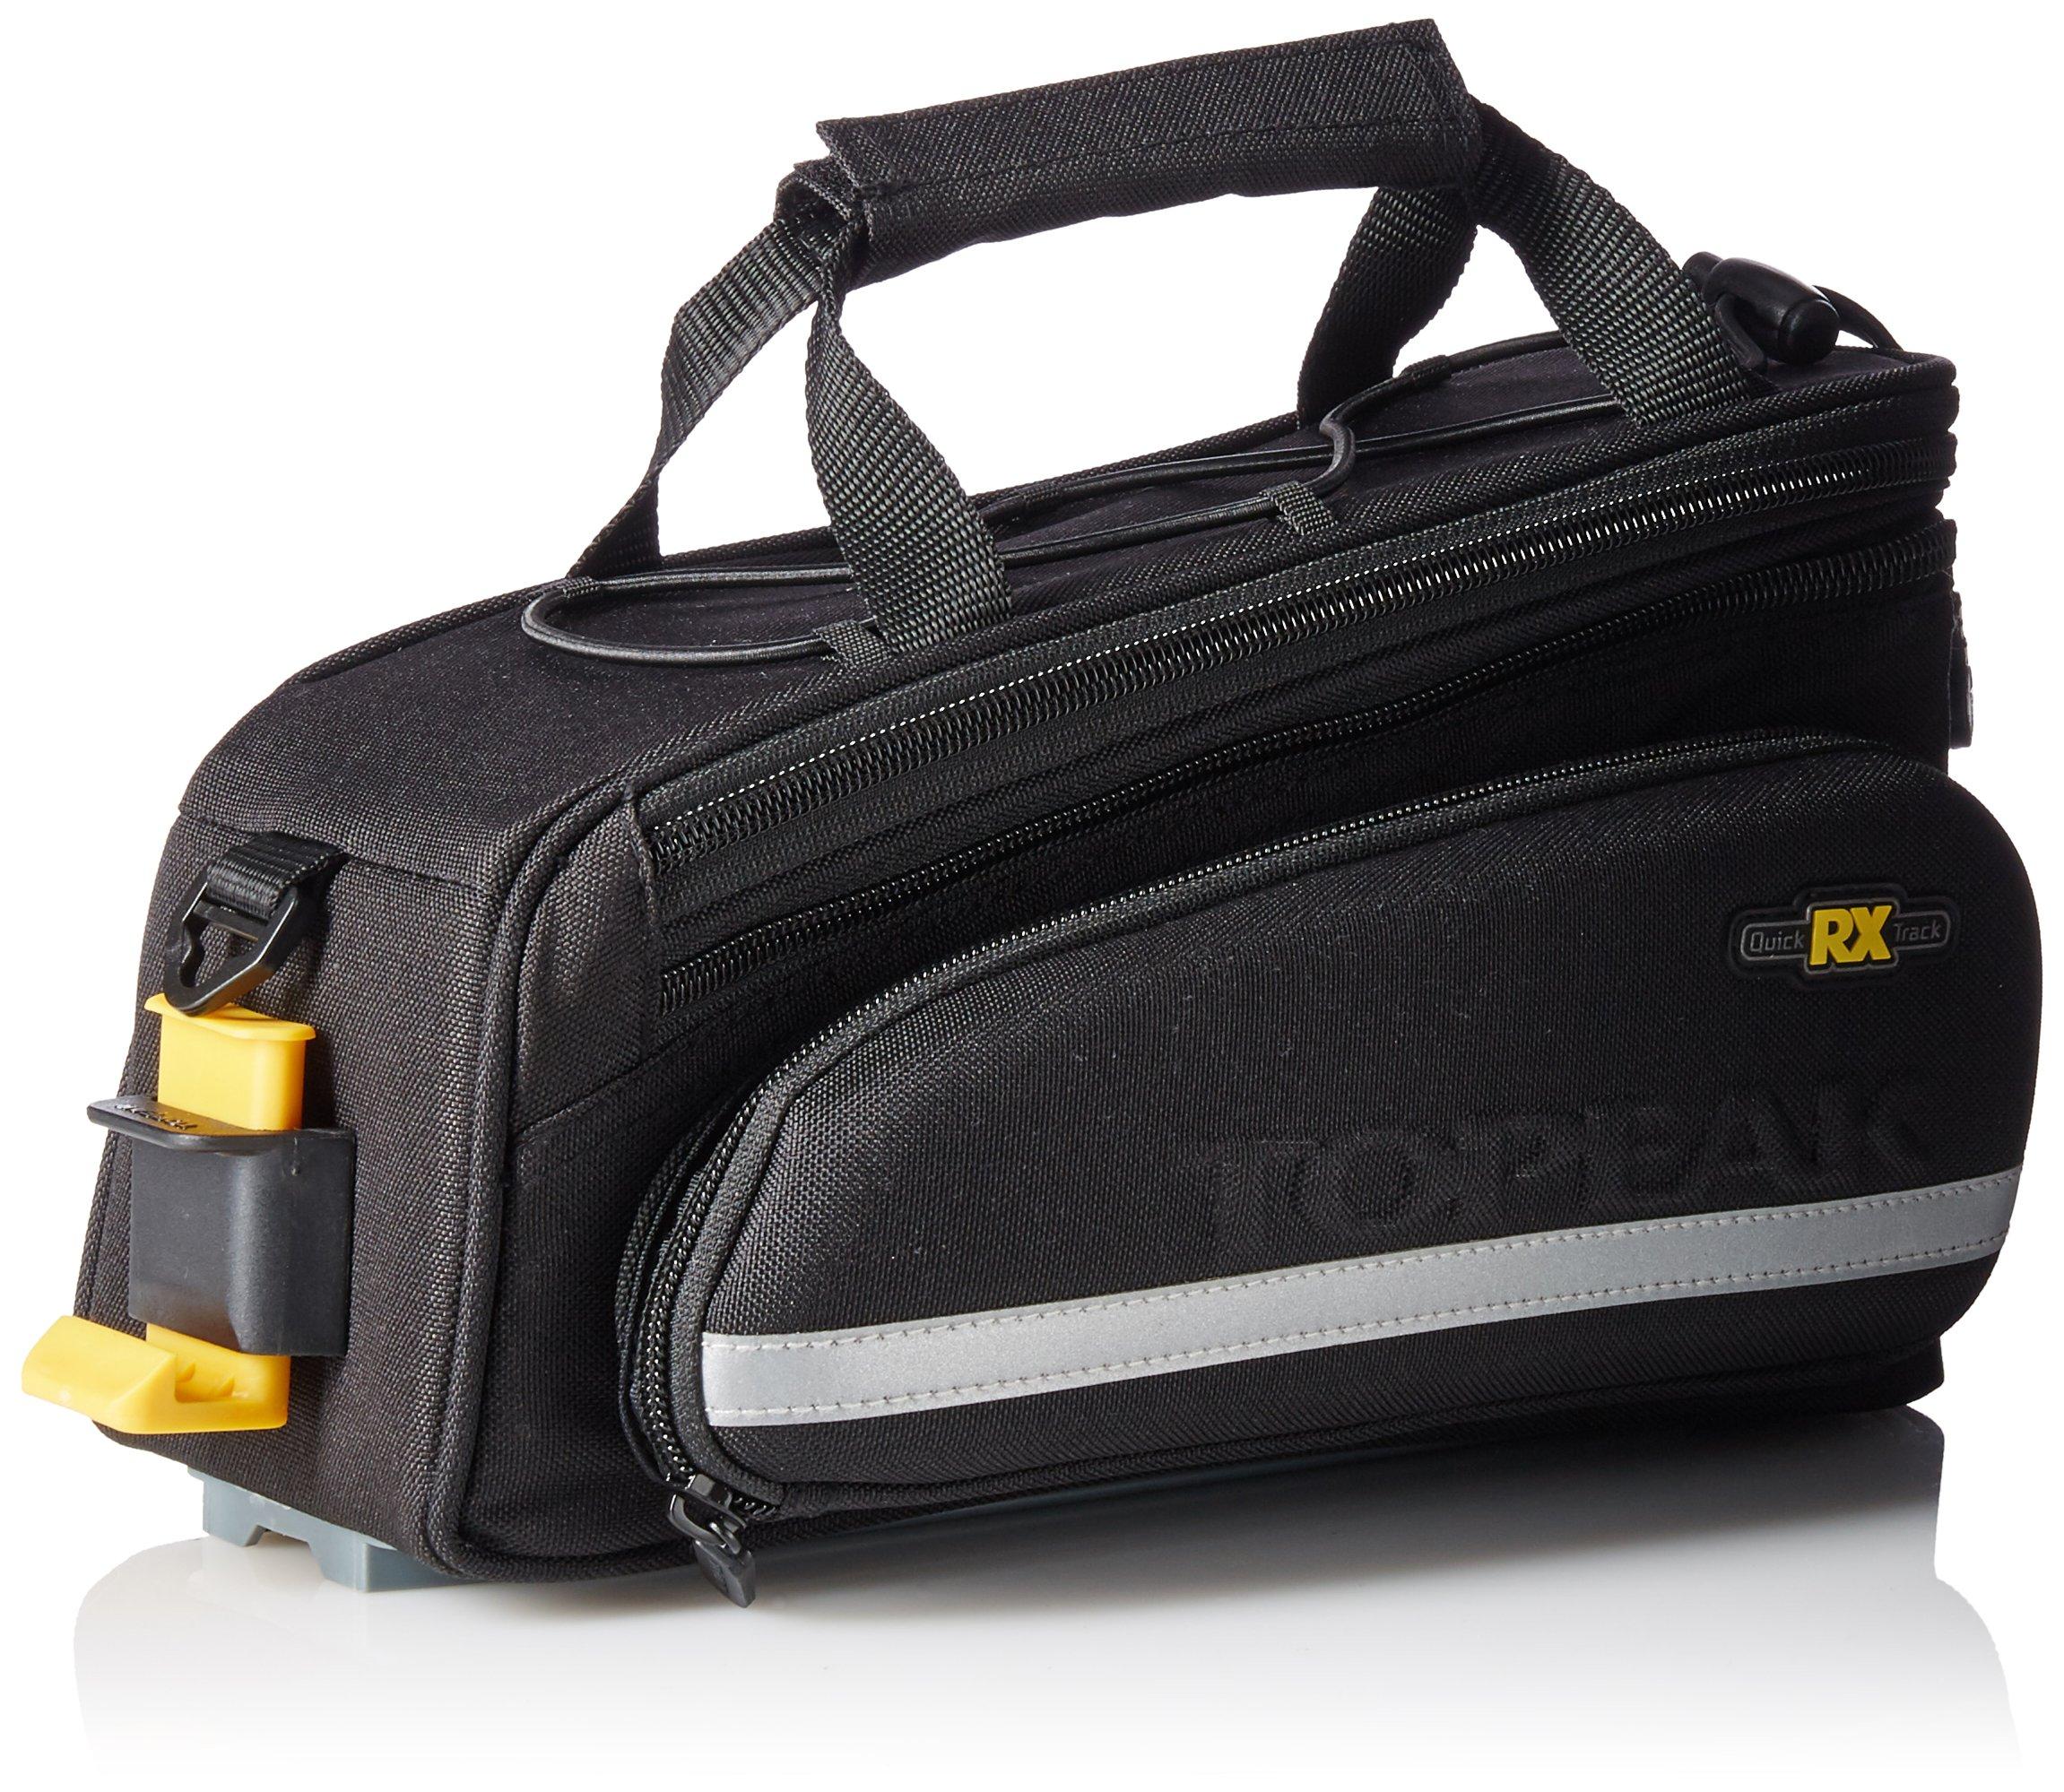 Topeak RX Trunk Bag DXP